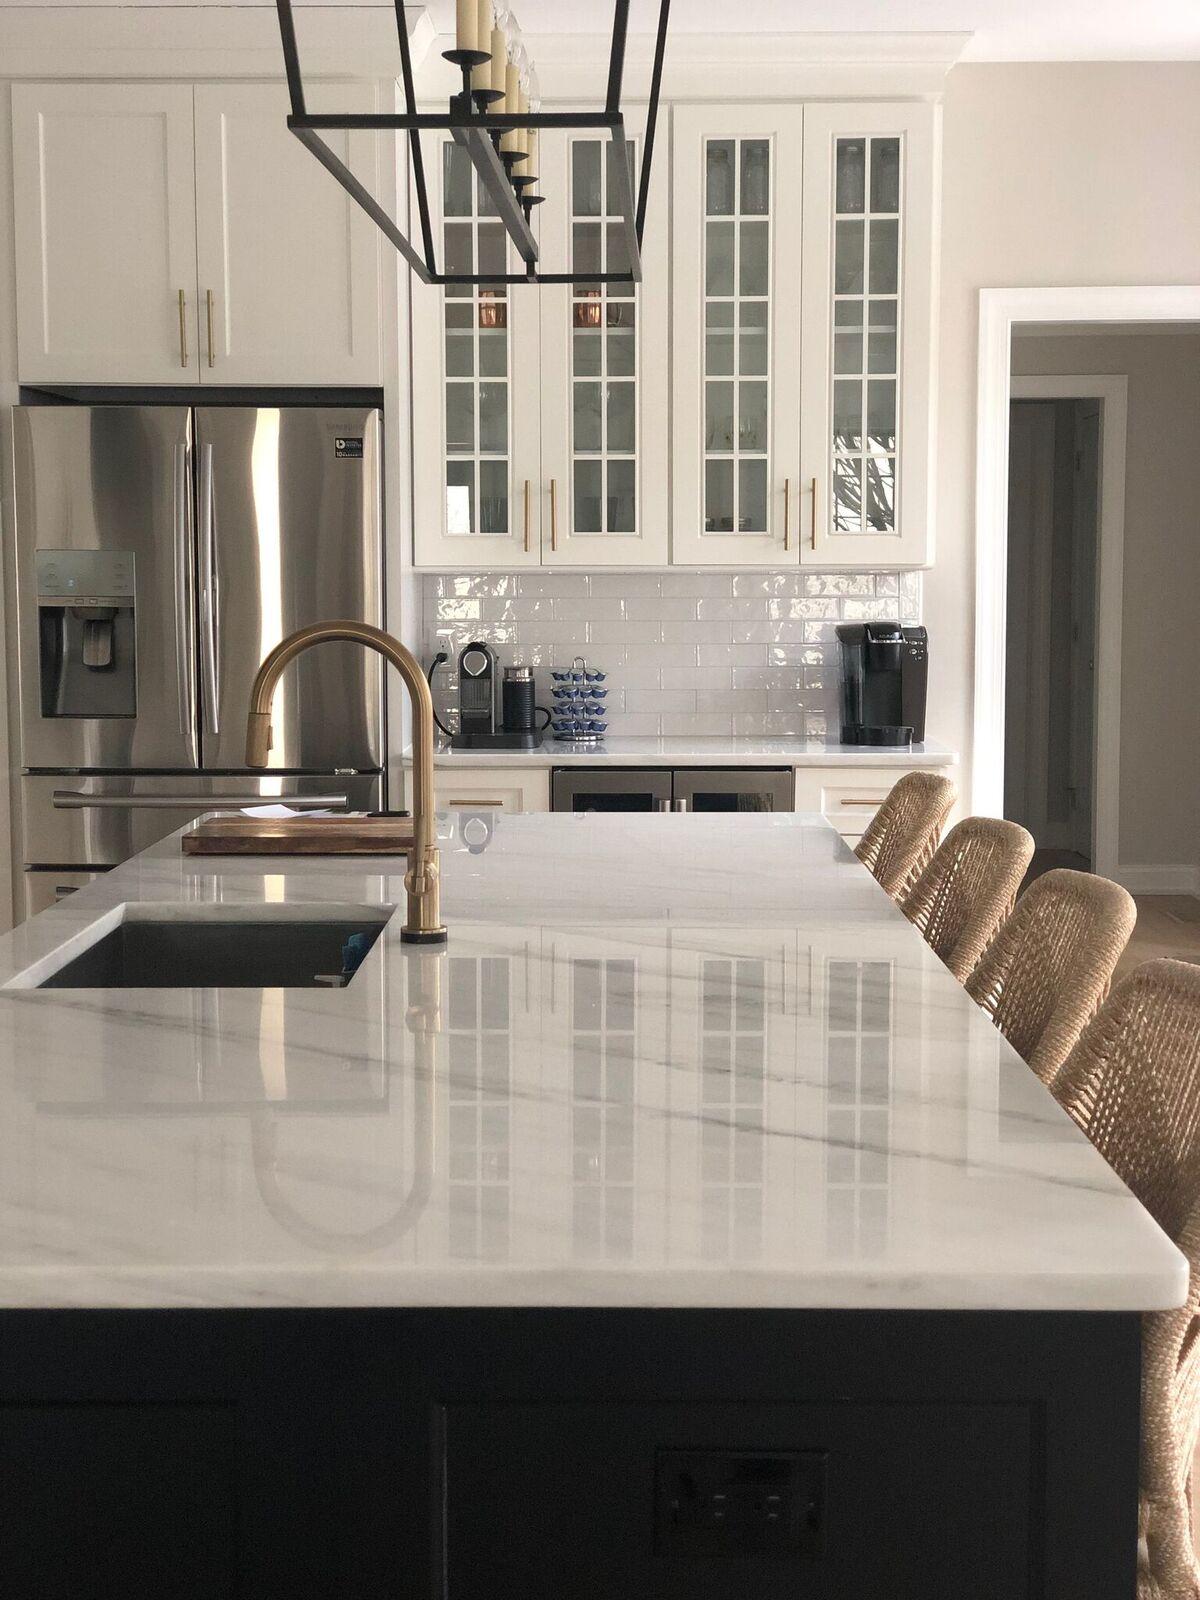 stephanie-kraus-designs-mainline-pa-kitchen-after-countertops.jpg